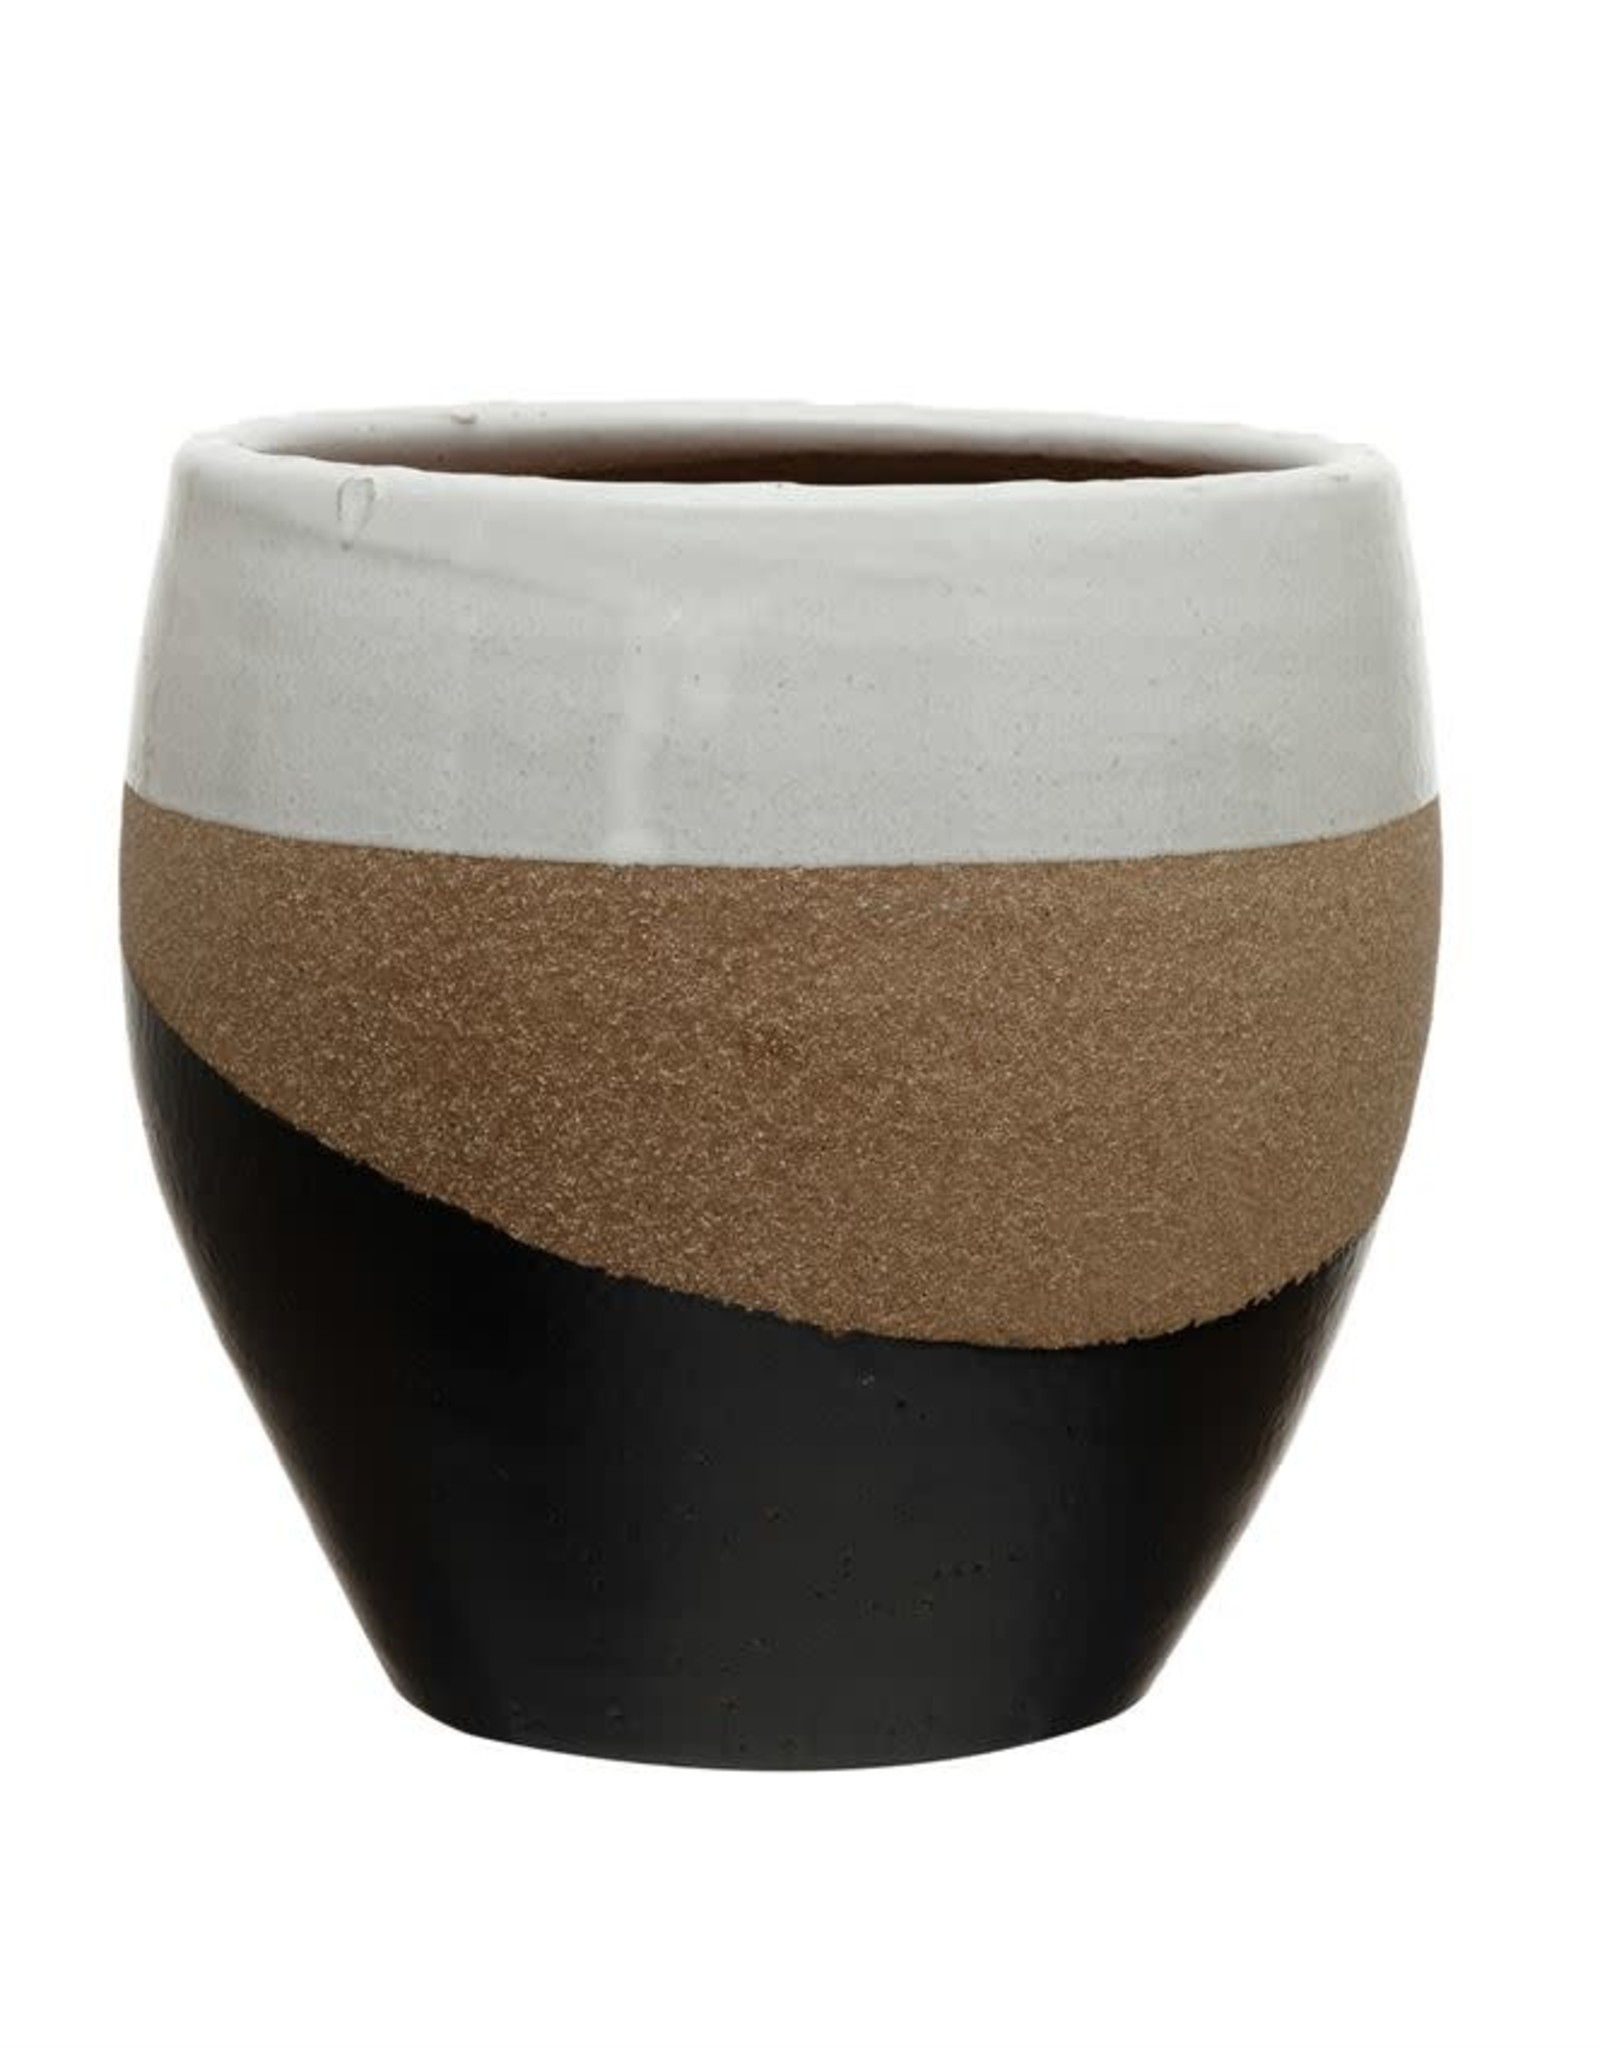 "Terracotta Planter - Multi Color (Holds 7"" Pot)"